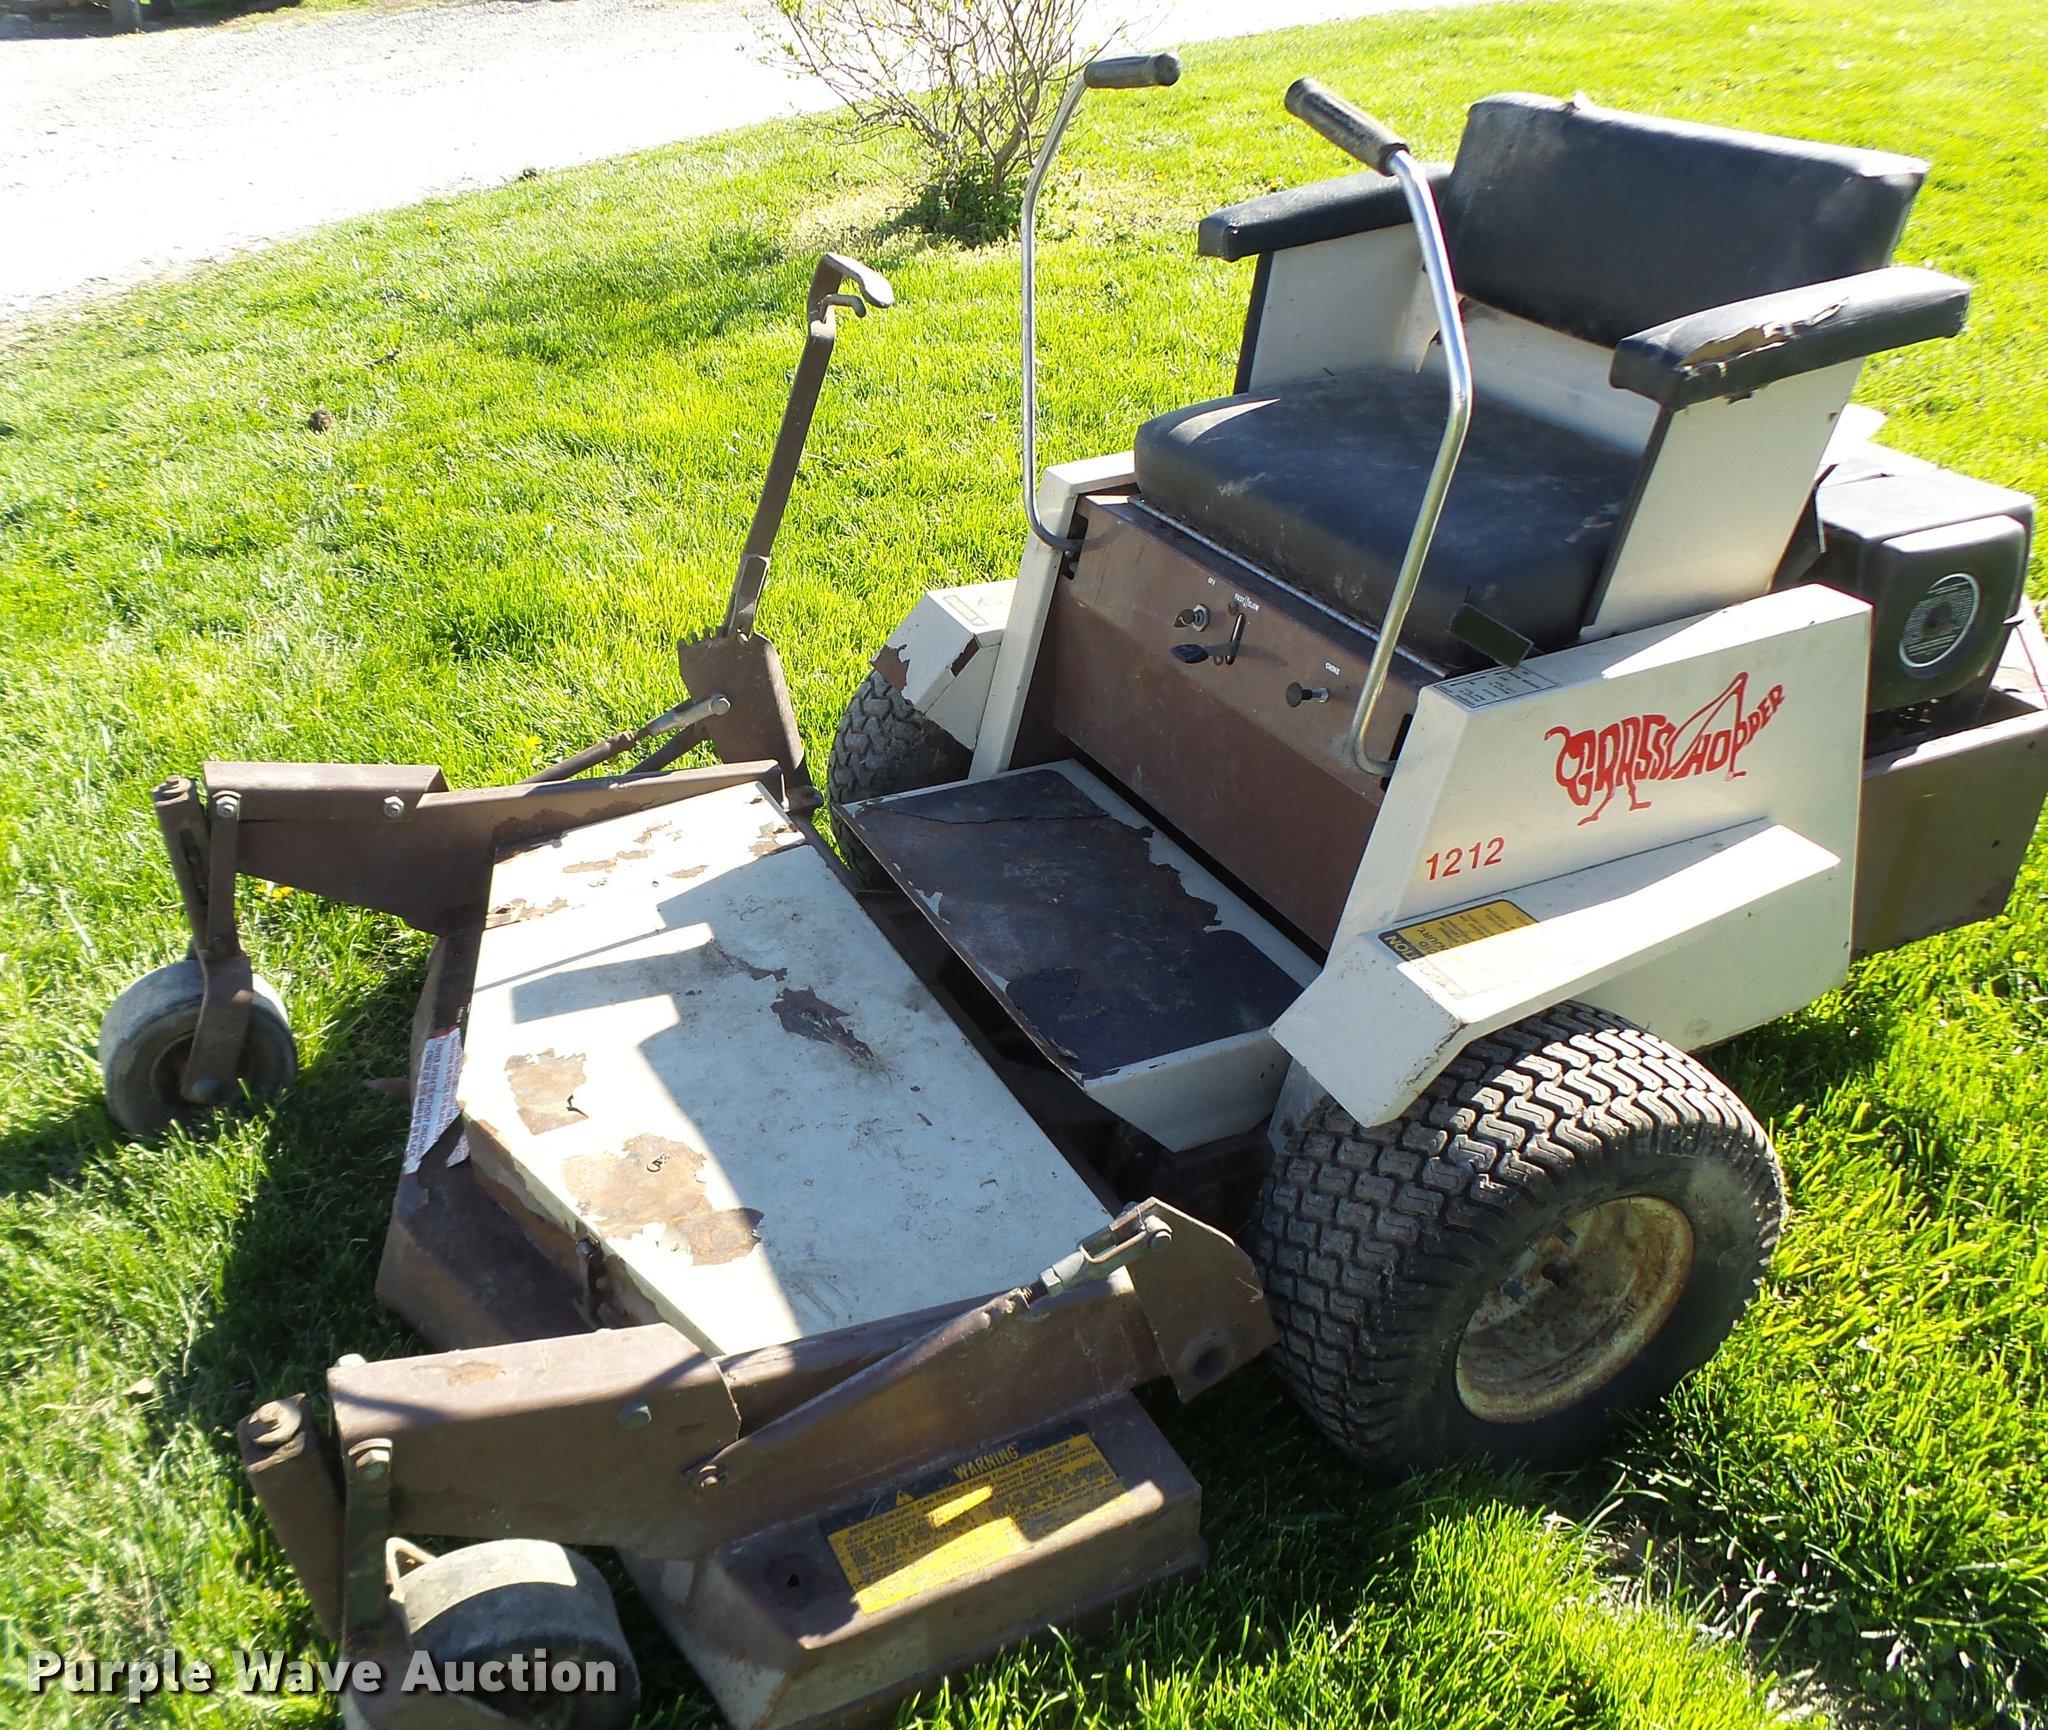 Grasshopper 1212 lawn mower | Item DA3454 | SOLD! May 10 Veh